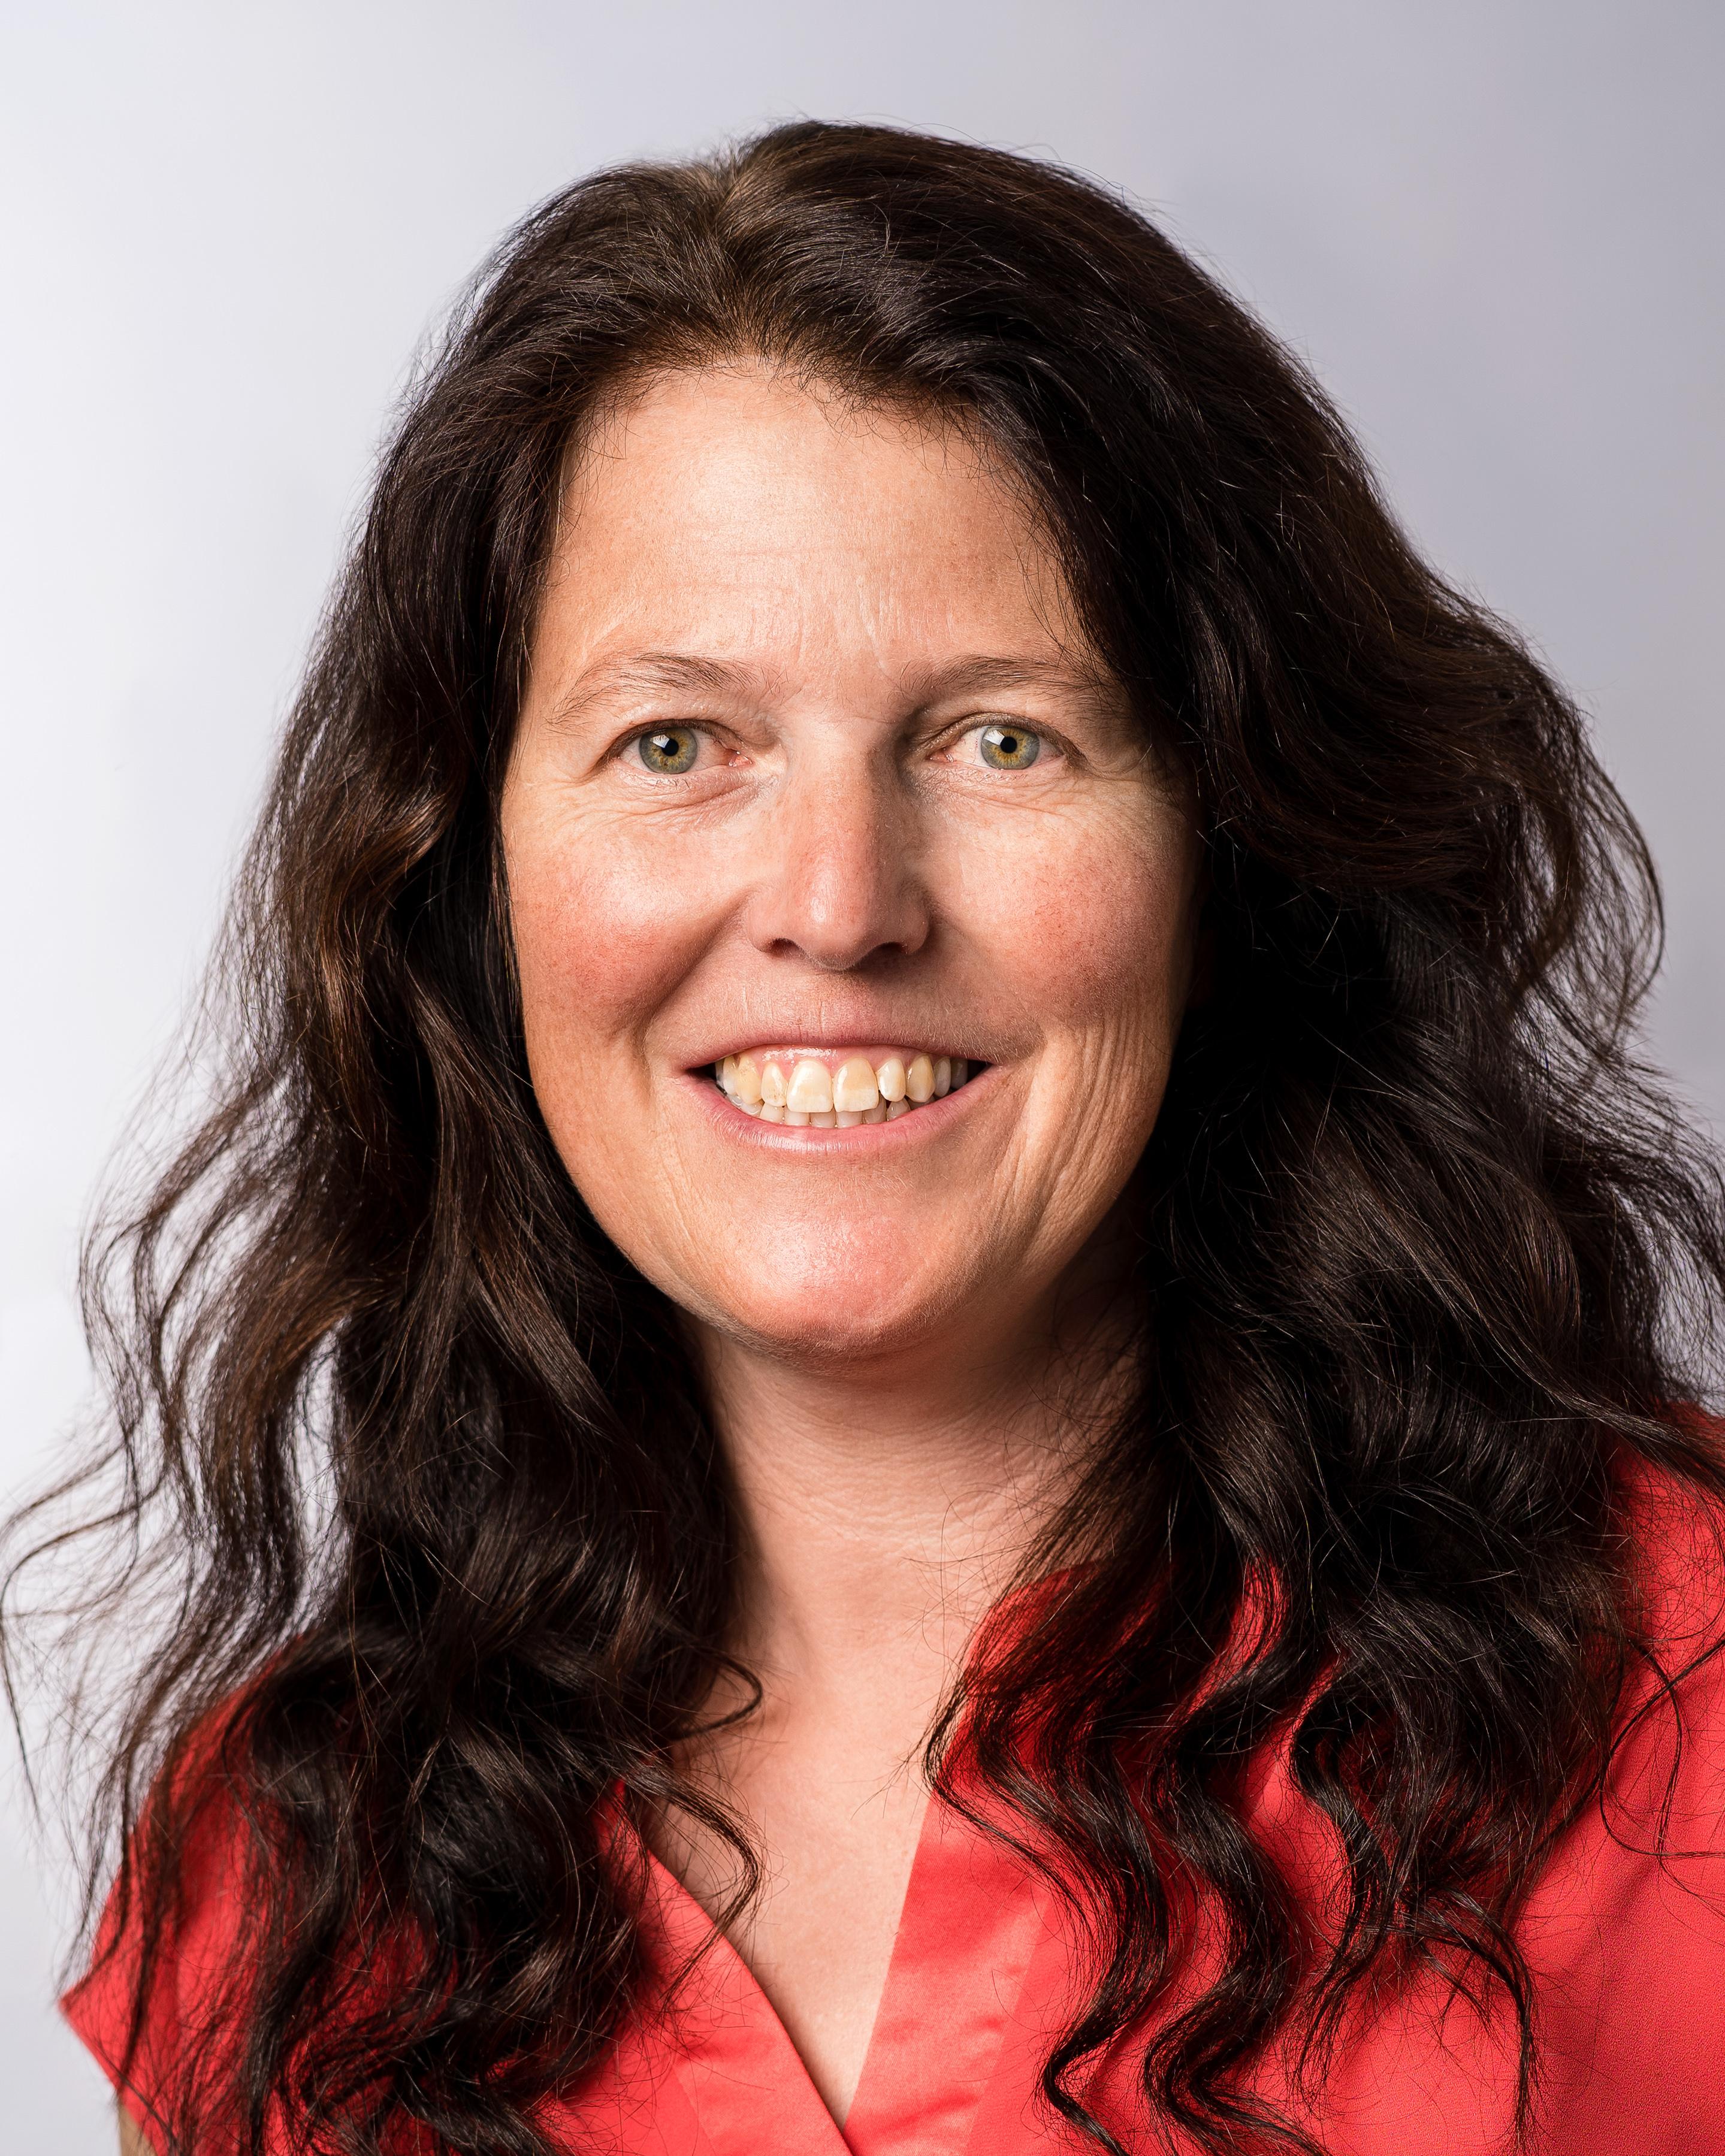 Daniela Roth